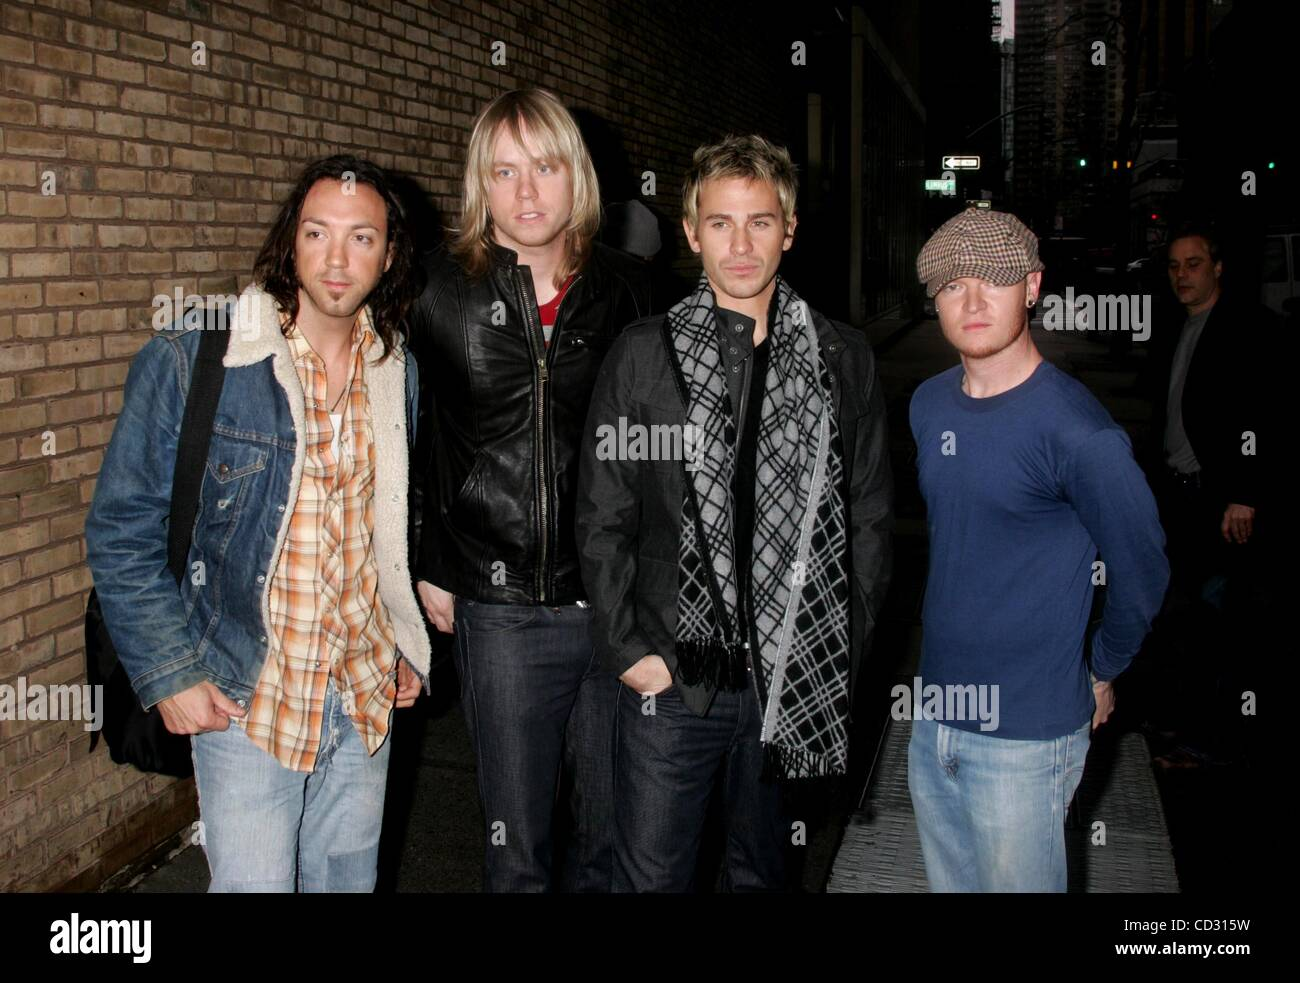 Apr. 1, 2008 - New York, New York, U.S. - GEFFEN RECORDING ARTIST, ''LIFEHOUSE'' LEAVING LIVE WITH - Stock Image